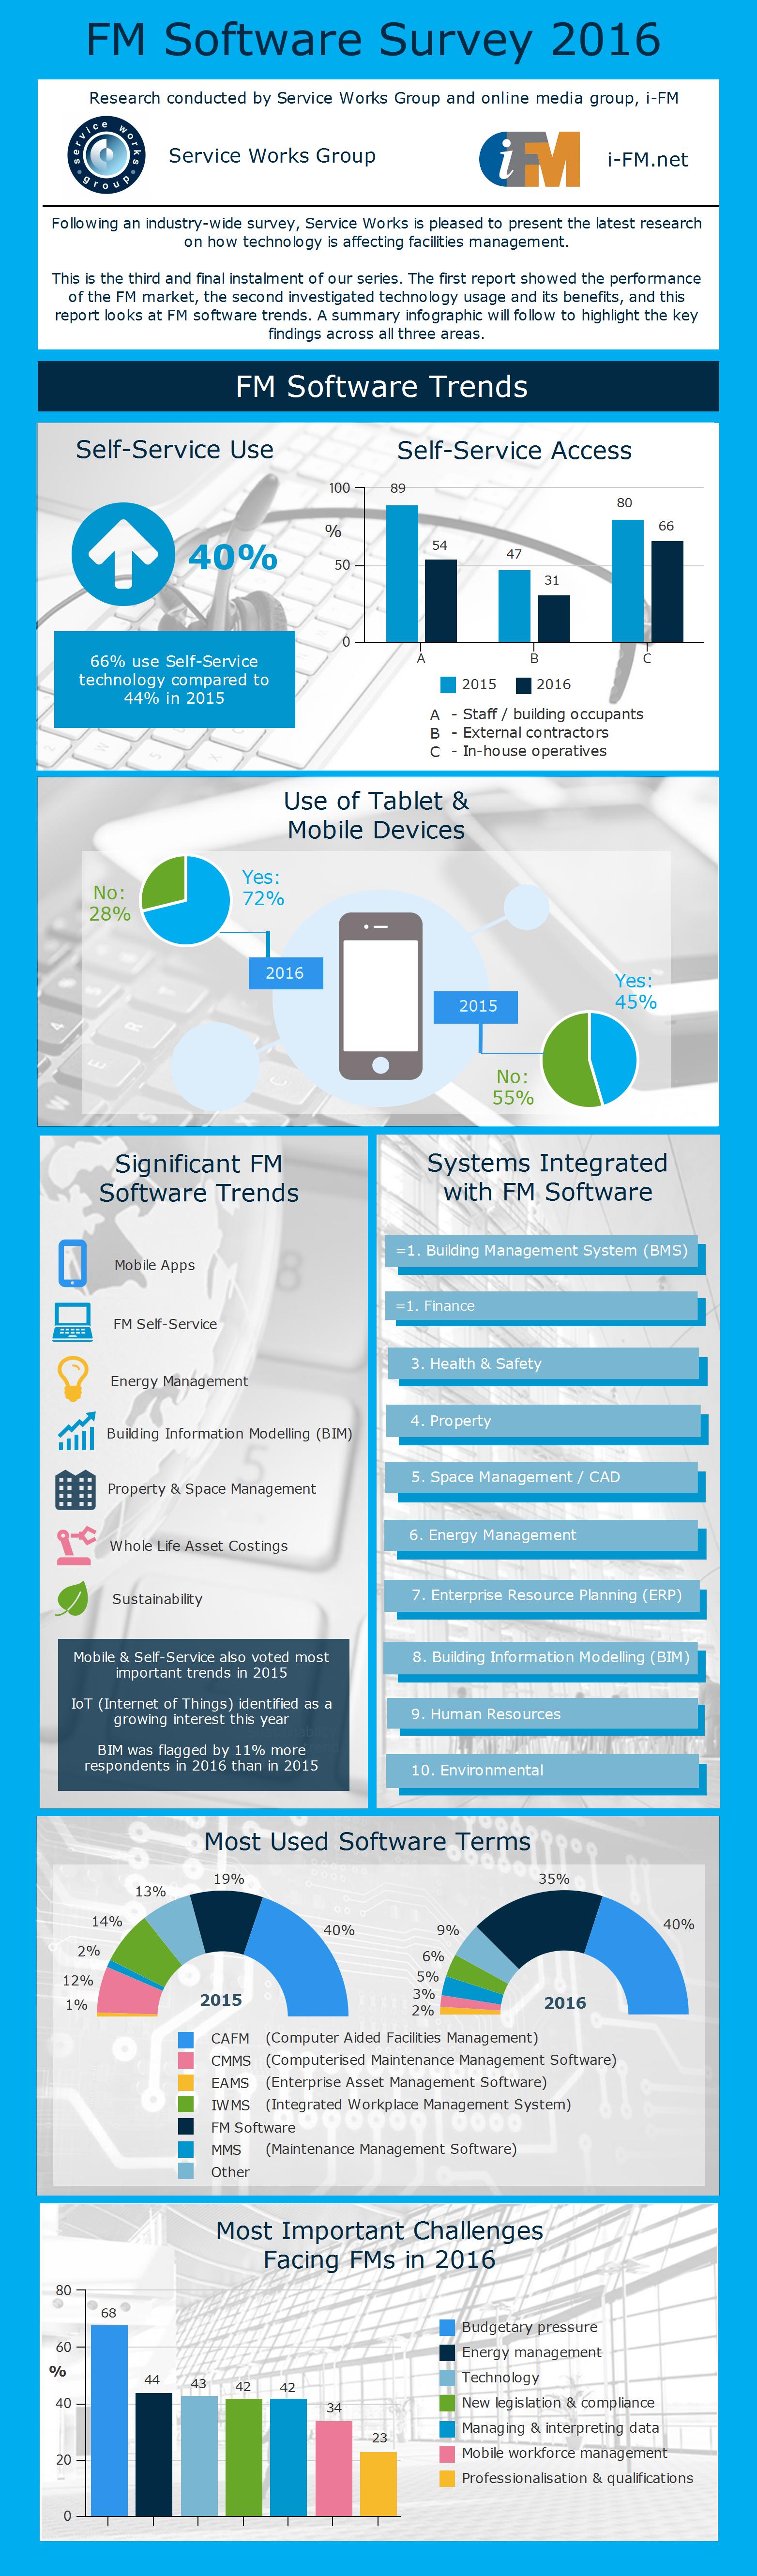 FM Software Survey 2016 - Software trends infographic